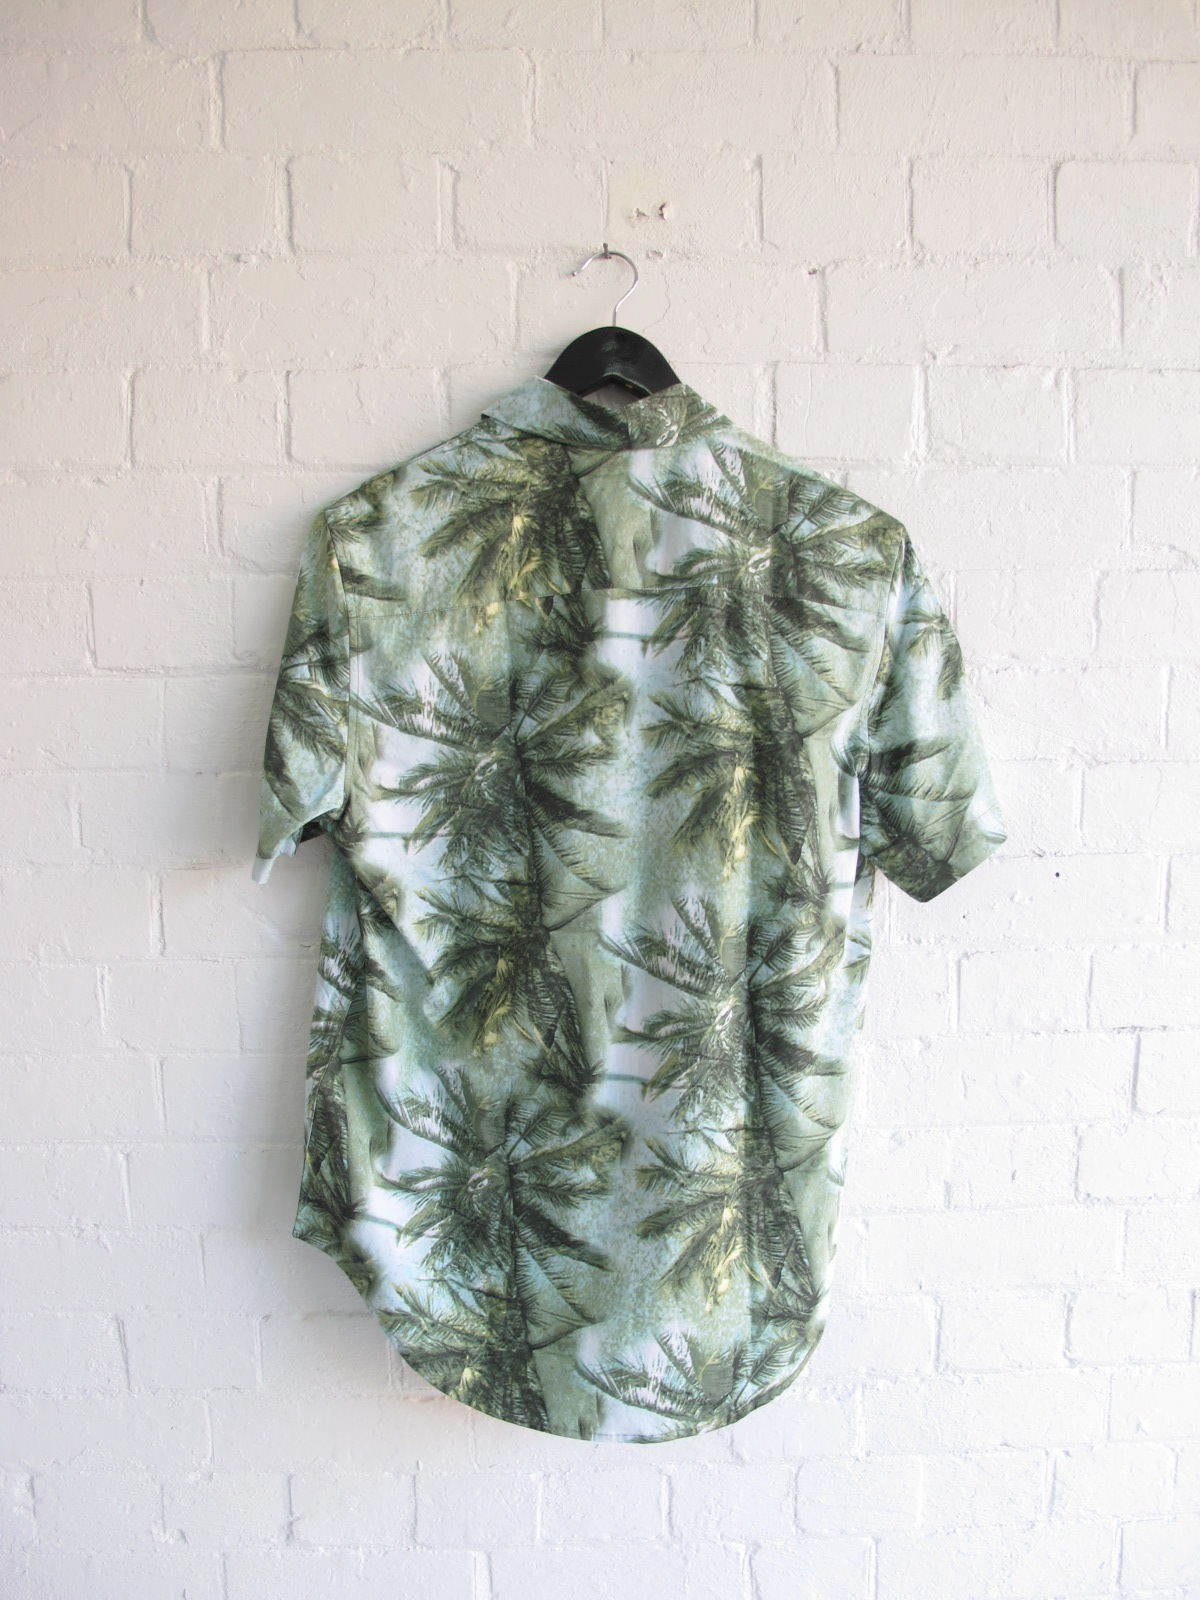 palm tree shirt - Second Floor Flat